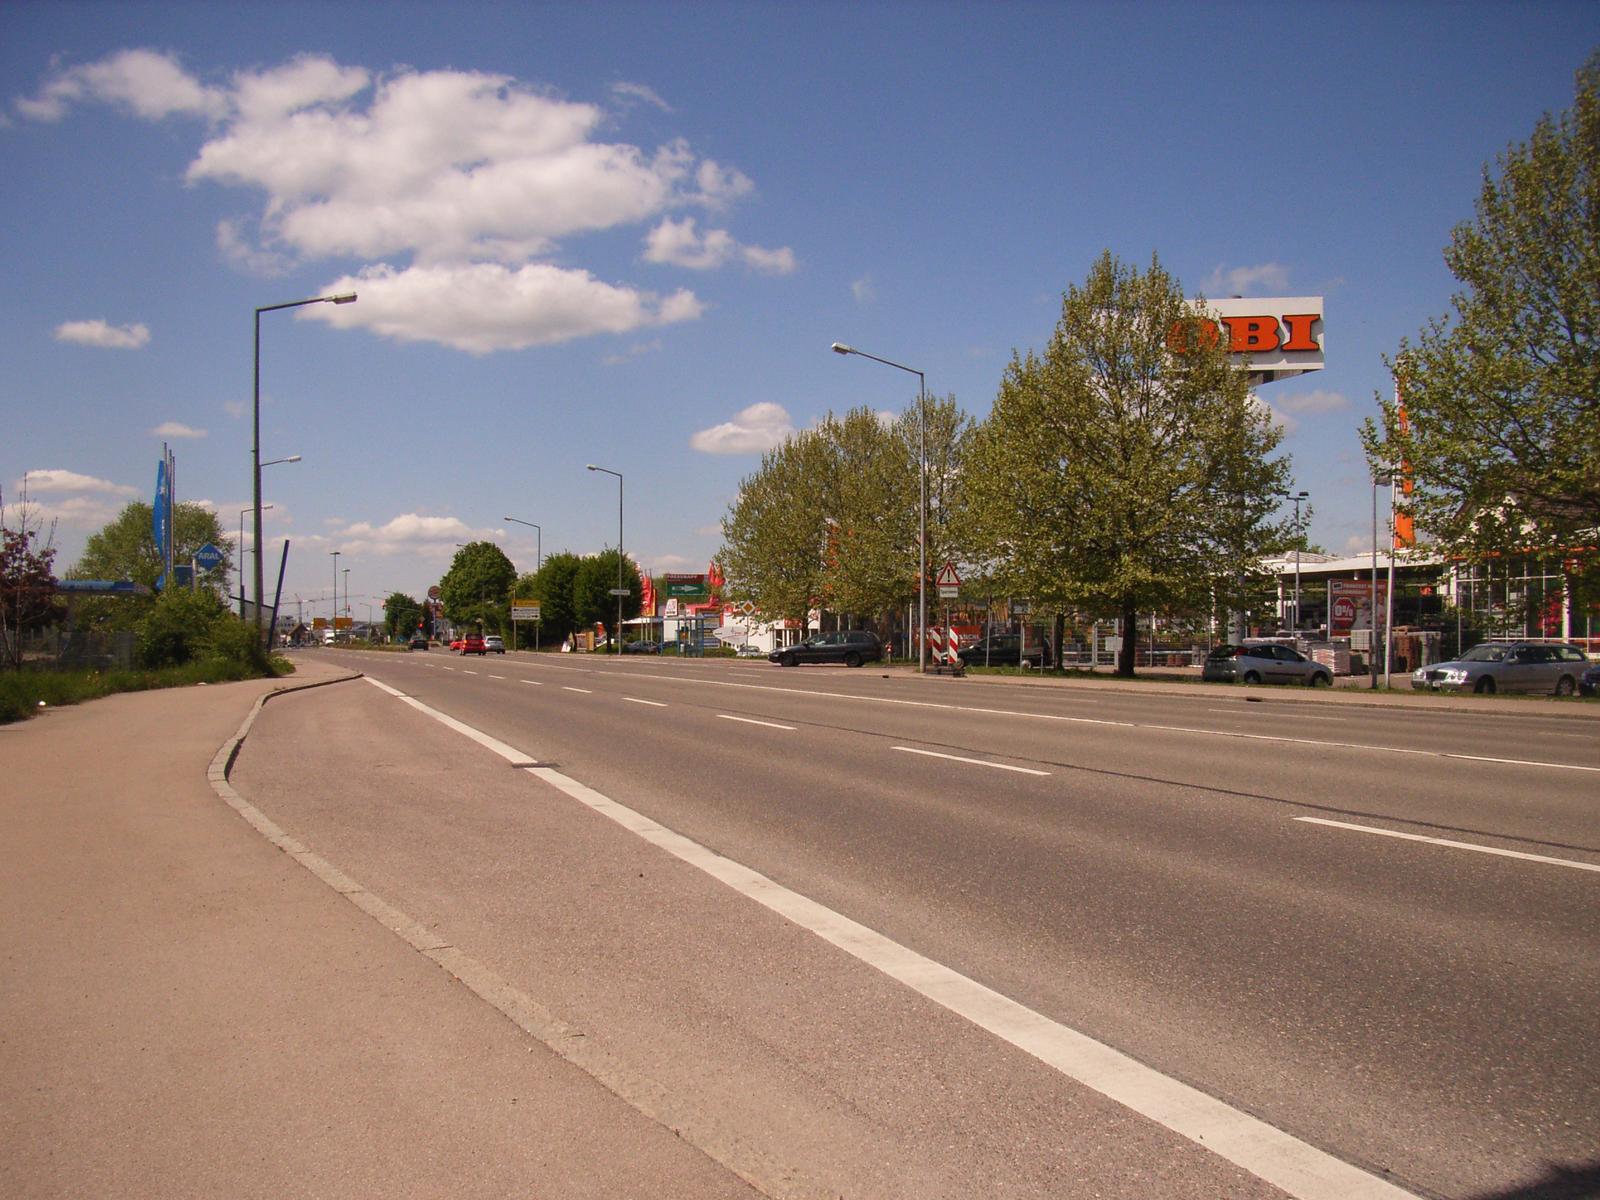 Verkehrslächen an der Stuttgarter Straße vor der Begrünung